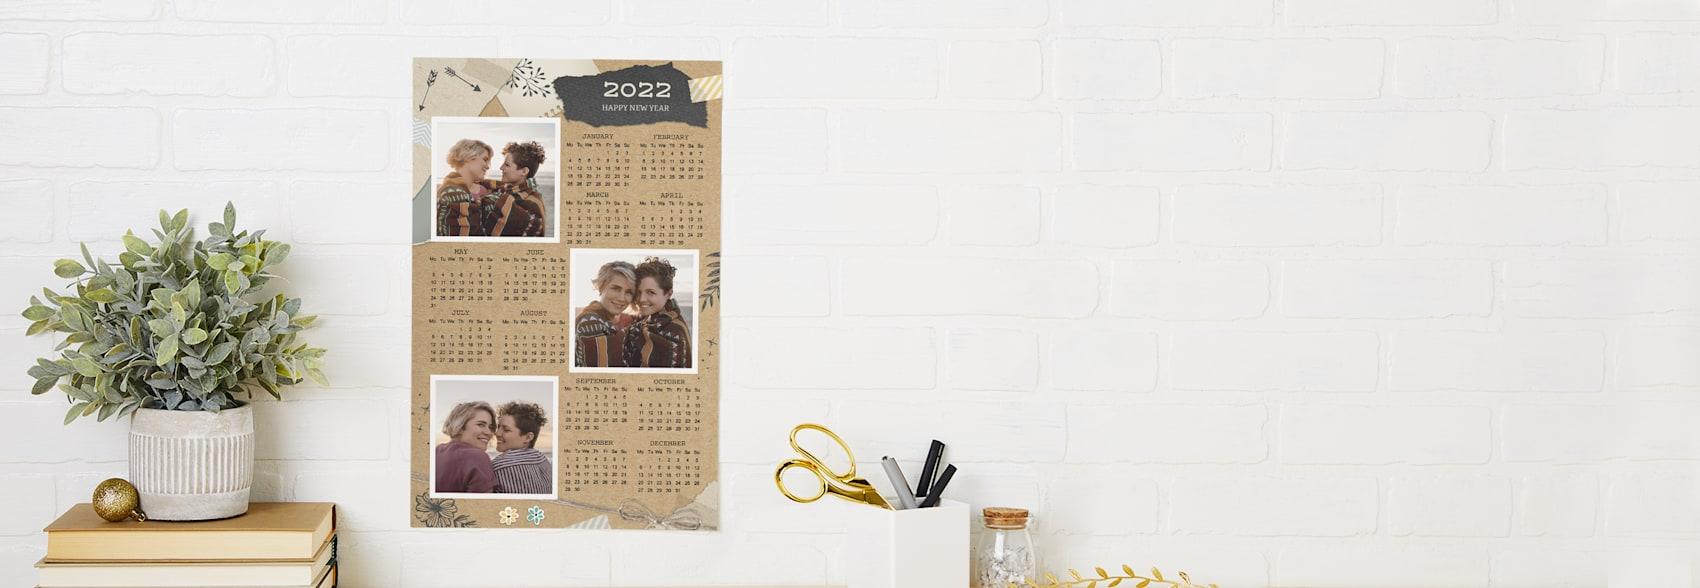 custom poster calendars